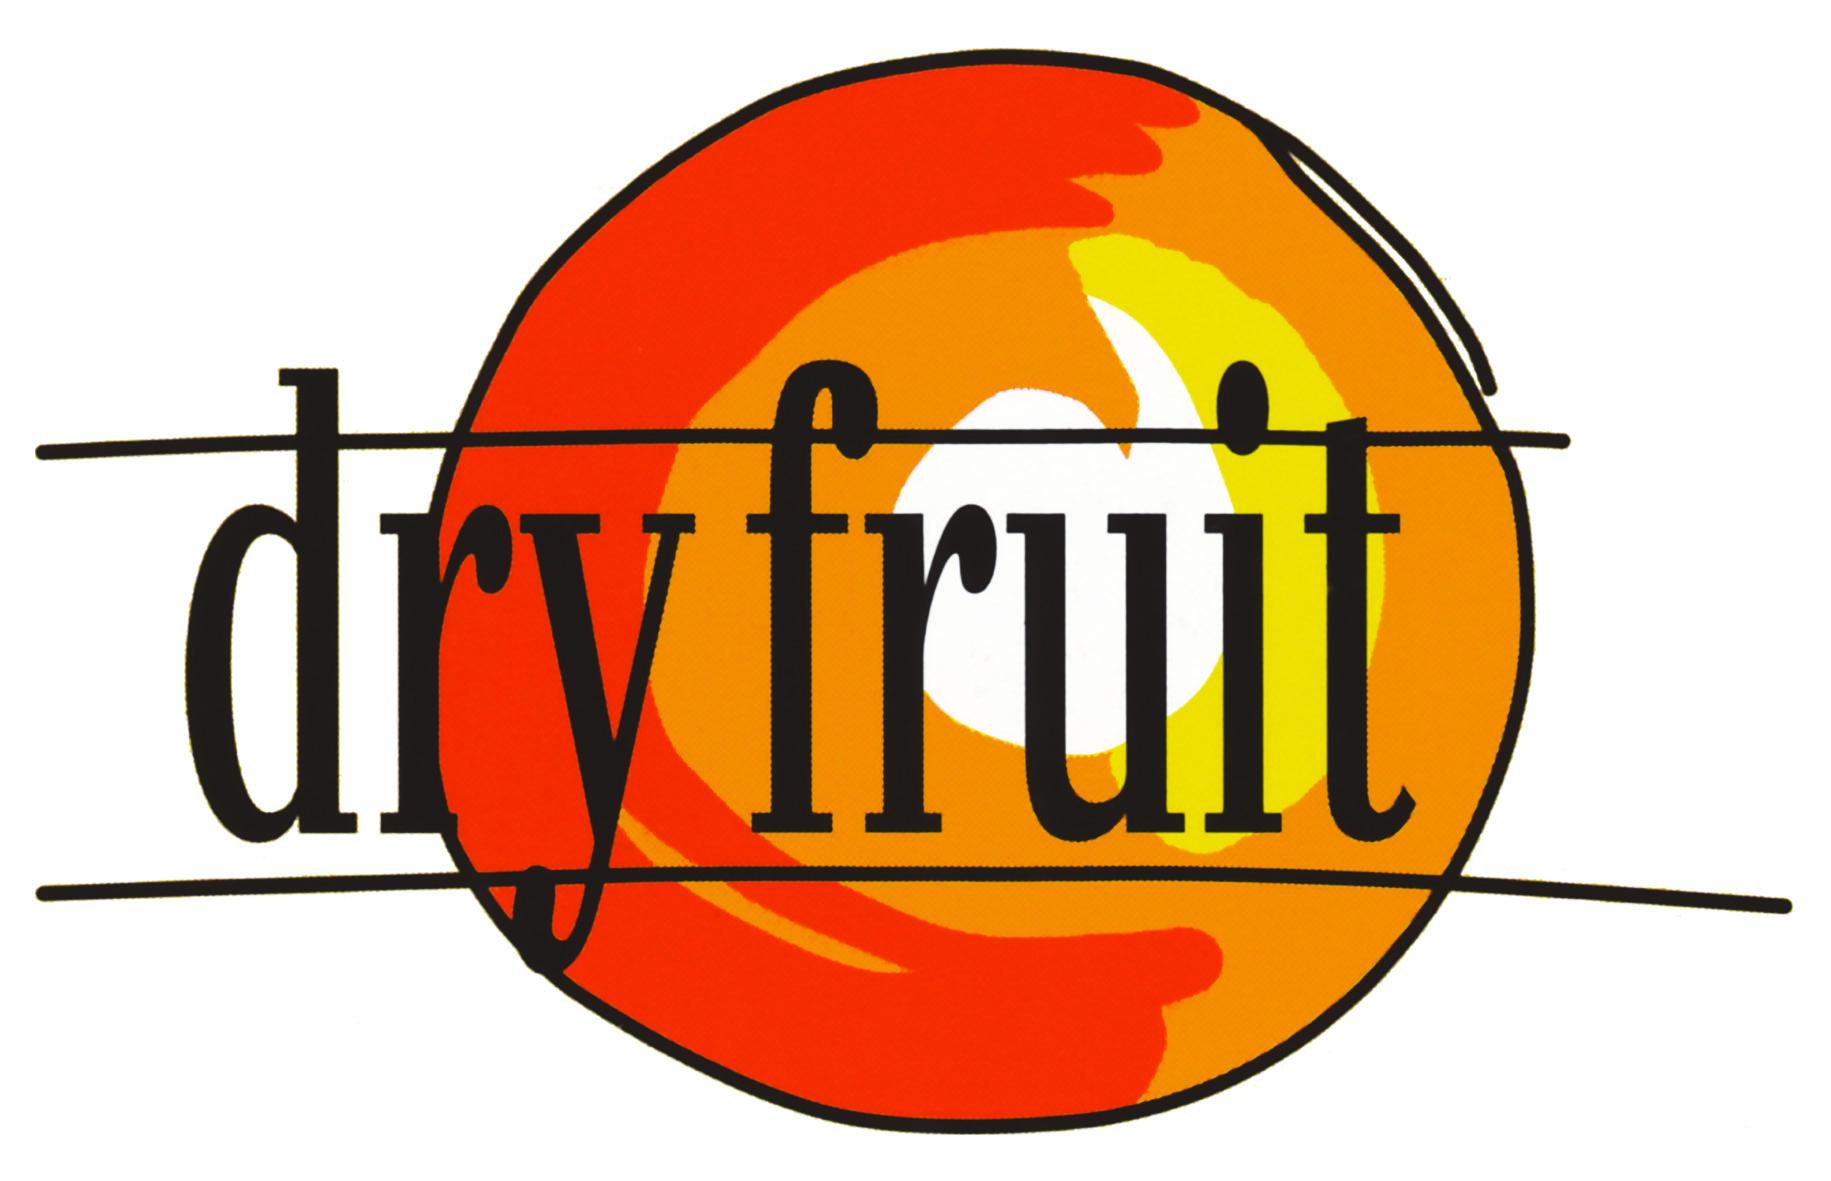 Dryfruit